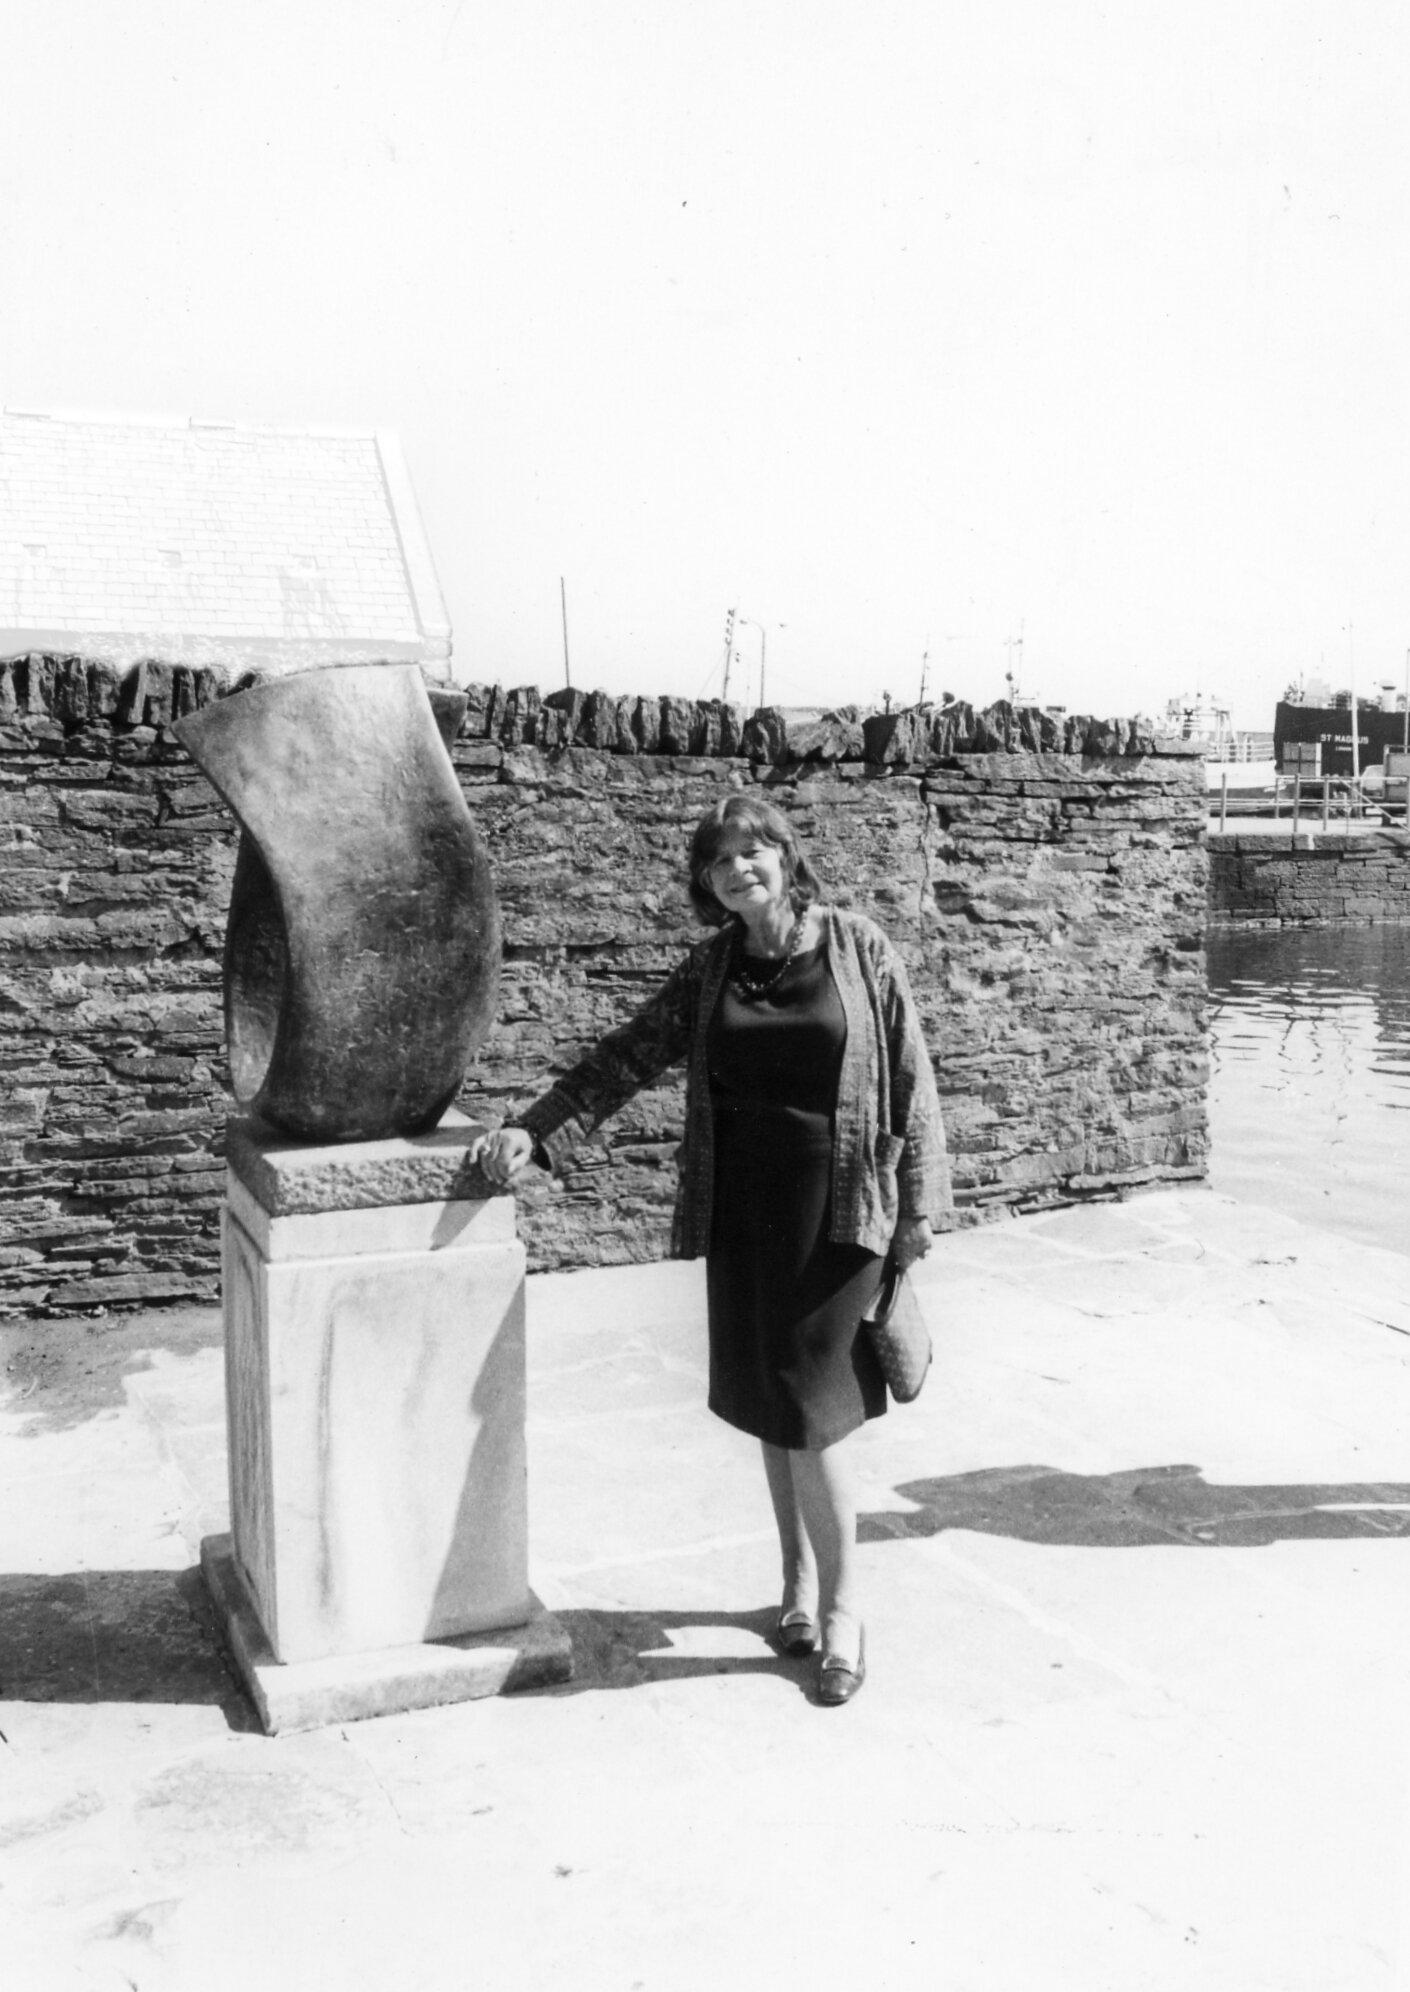 Image: Margaret Gardiner c. 1980 at the Pier Arts Centre  with Barbara Hepworth's sculpture  Curved Form (Trevalgan)  1956